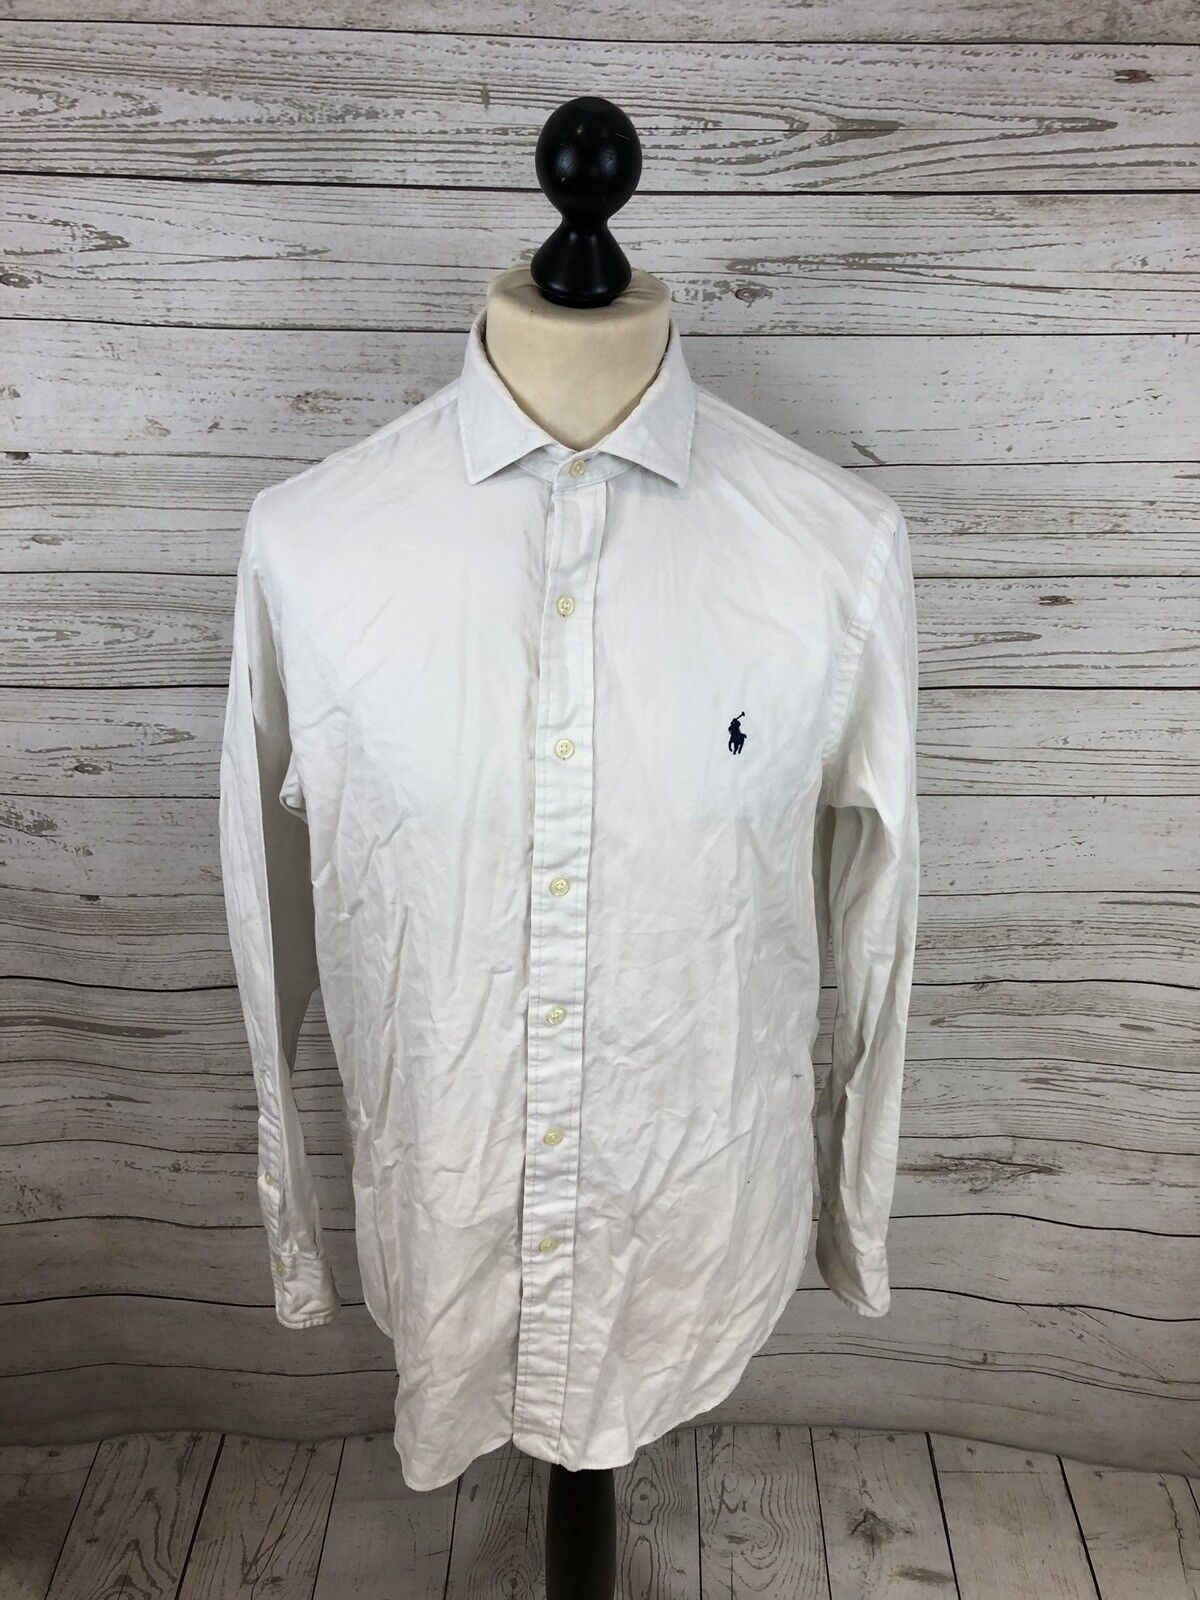 RALPH LAUREN Shirt - Size Medium - White - Great Condition - Men's